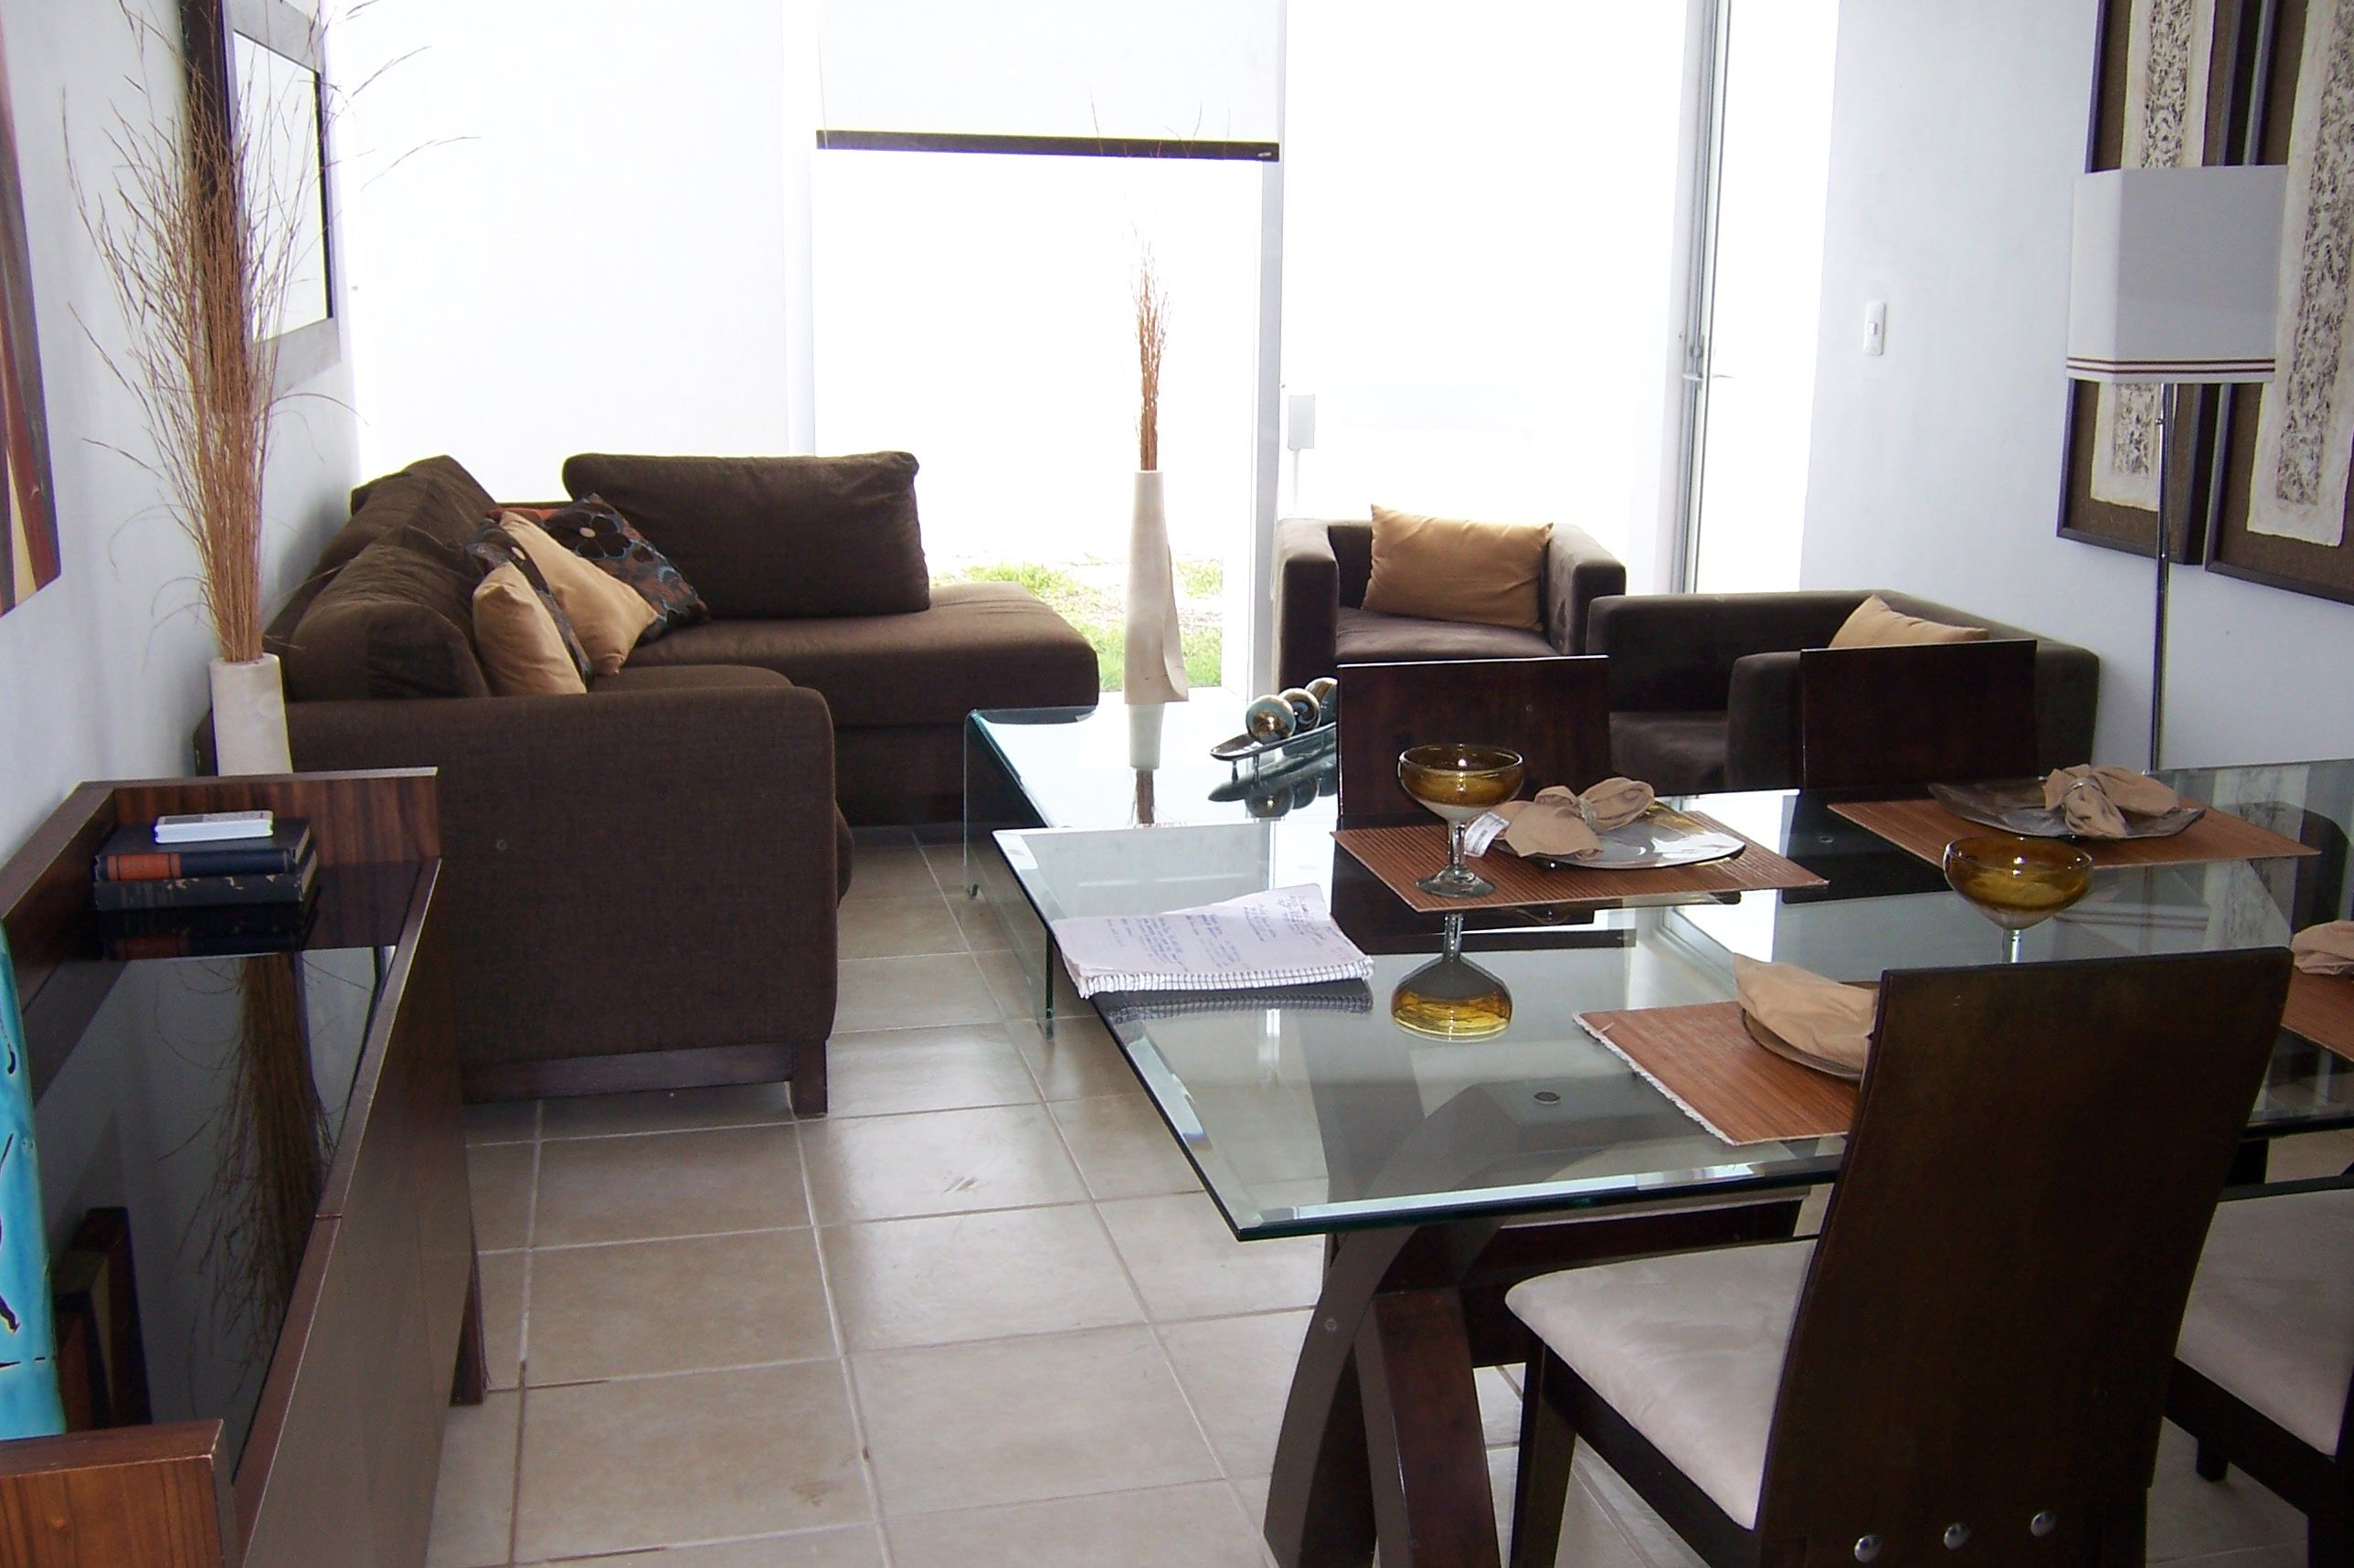 Salas modernas muebles para cocinas modernos departamentos for Decoracion para departamentos